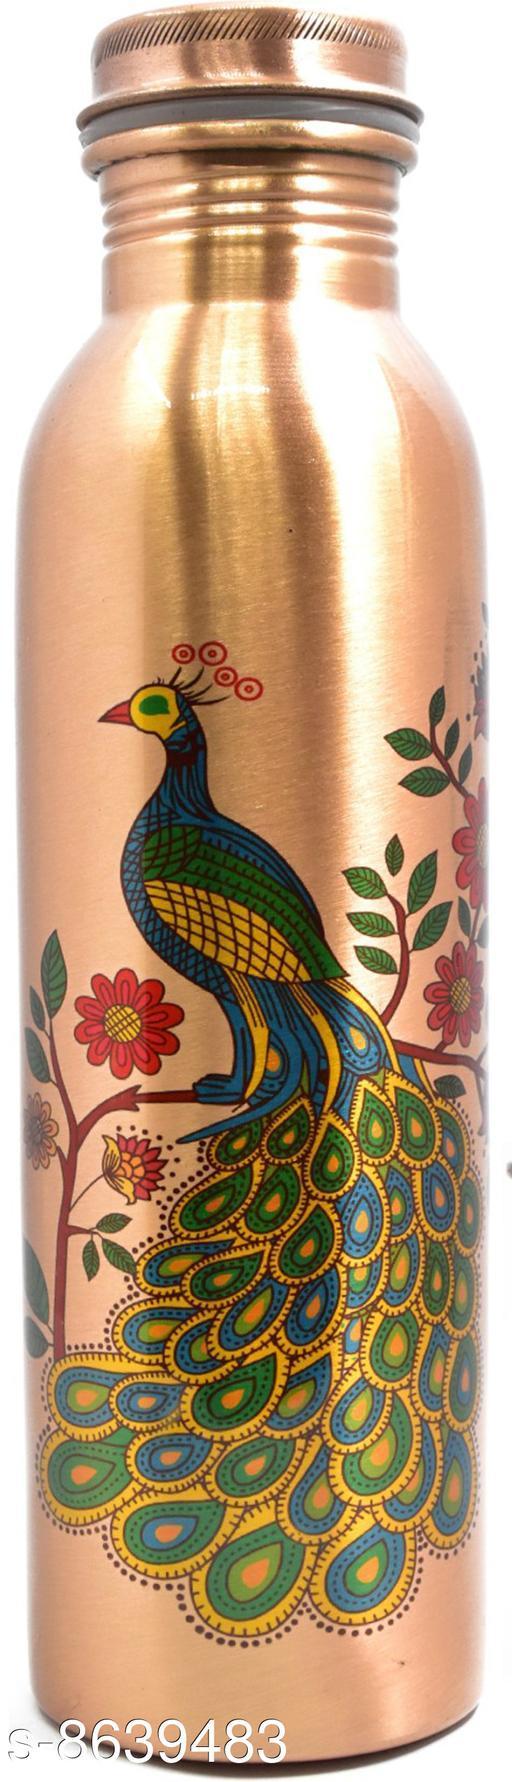 Indipot Premium quality high grade 100% pure copper water bottle 1000ml